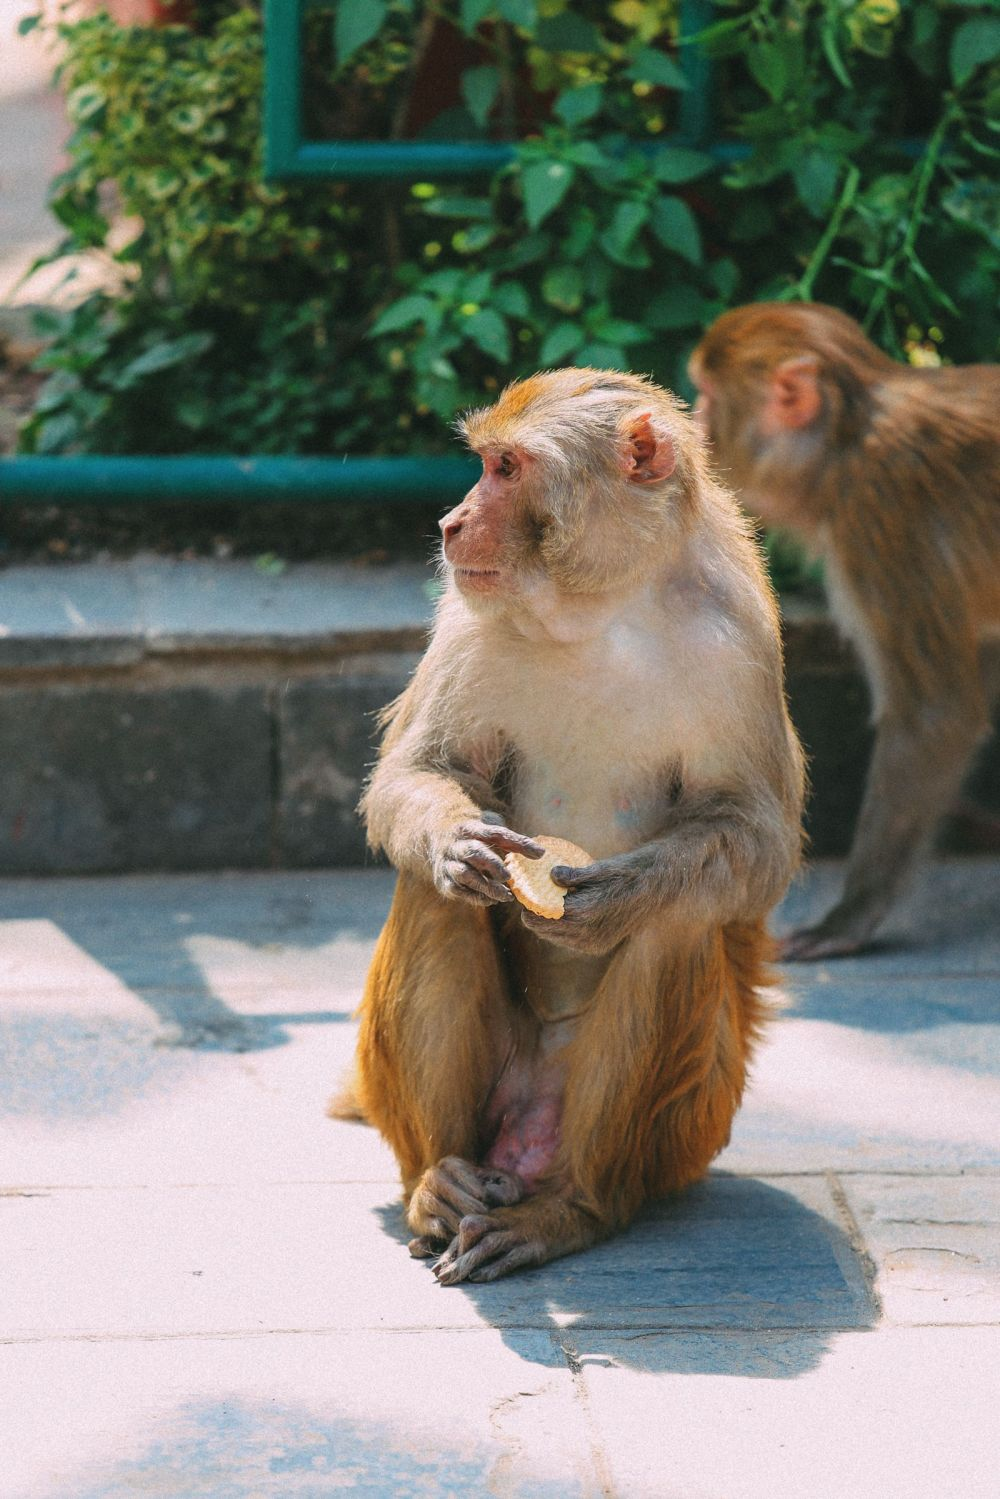 Exploring Swayambhunath Stupa - The Monkey Temple In Kathmandu, Nepal (50)